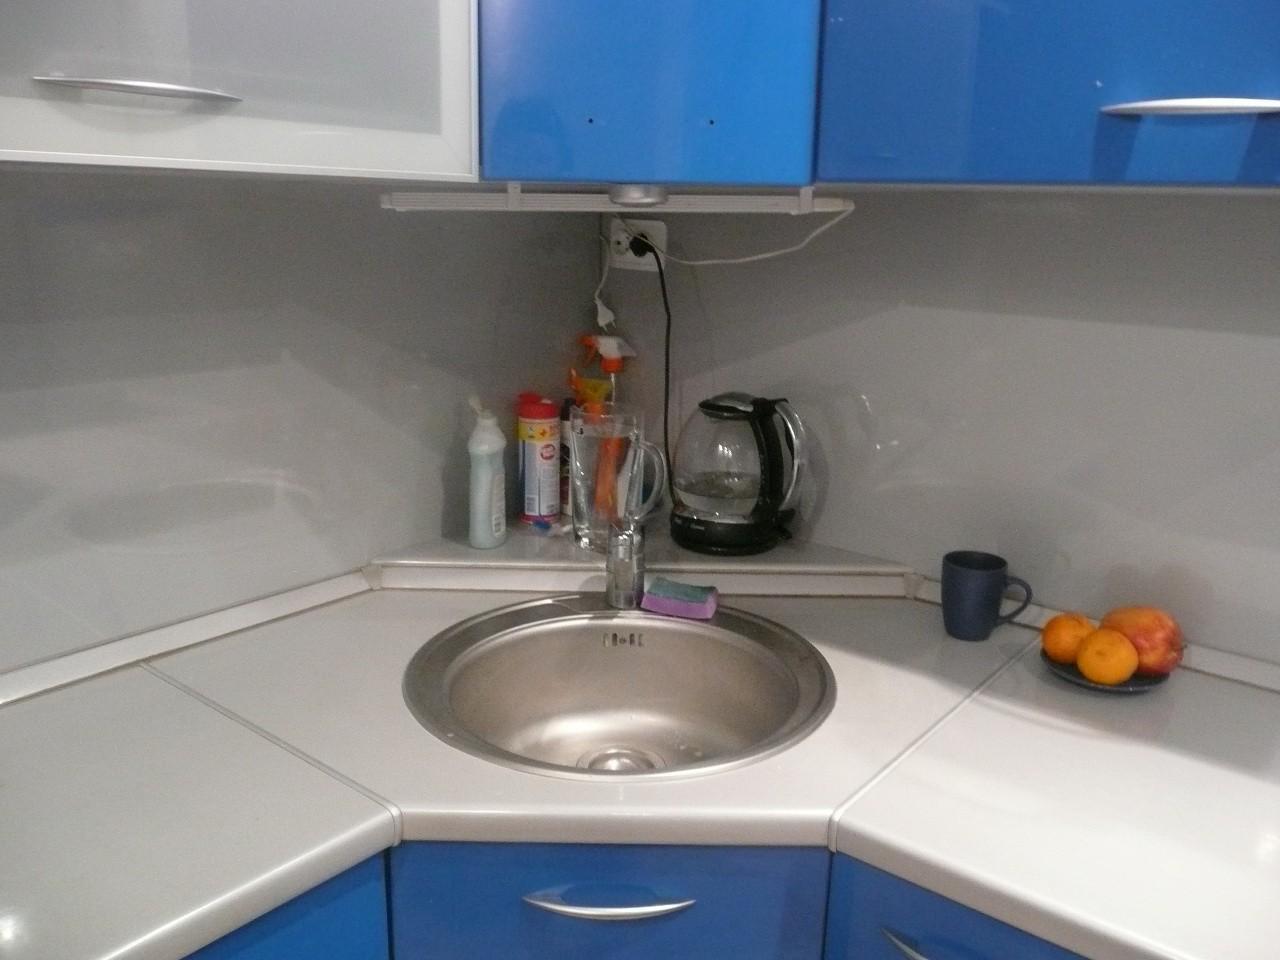 Картинки угловой мойки в кухне